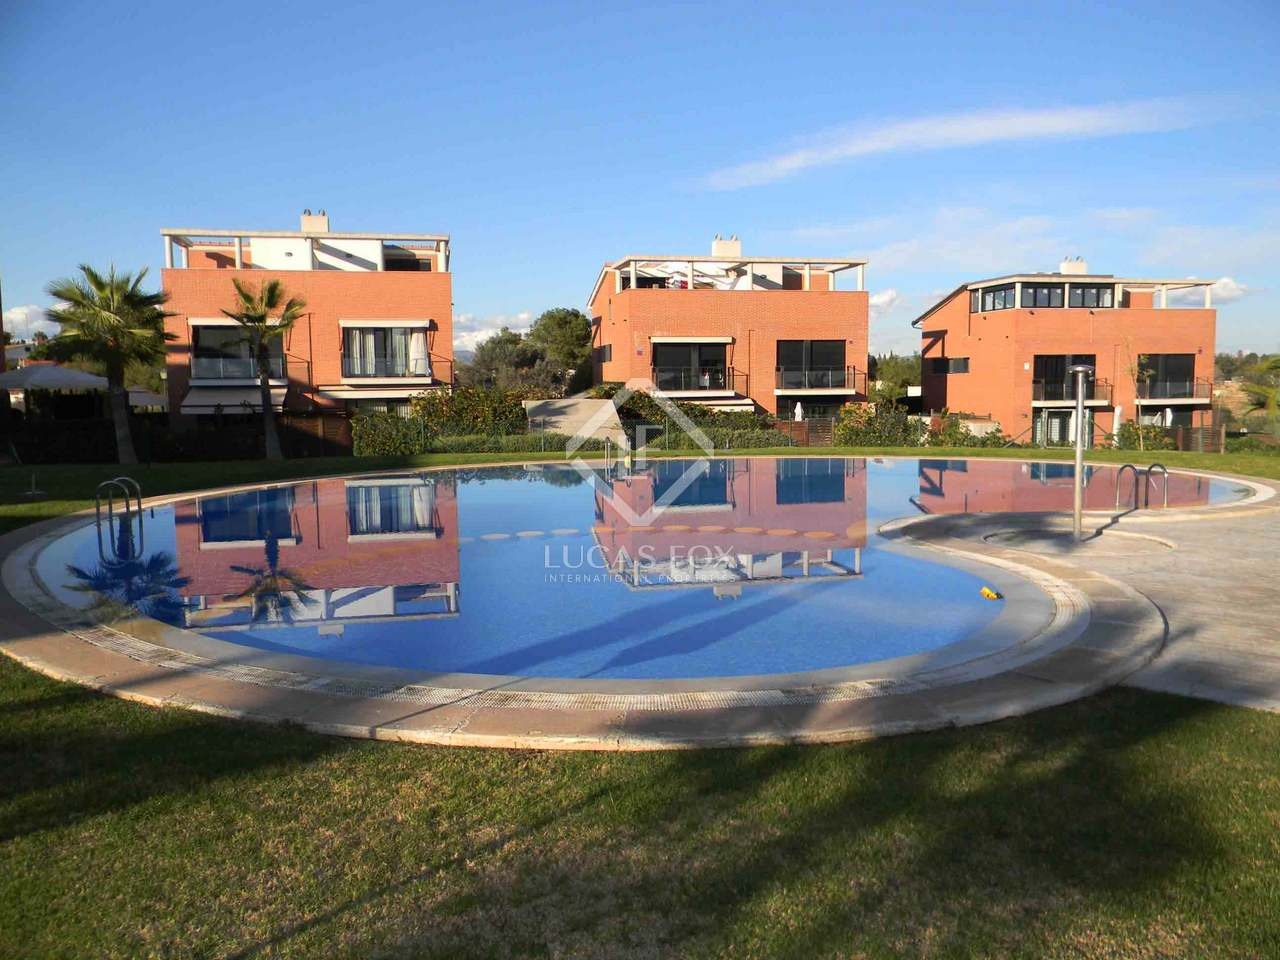 Chalet con piscina en venta en campolivar godella - Chalet con piscina ...